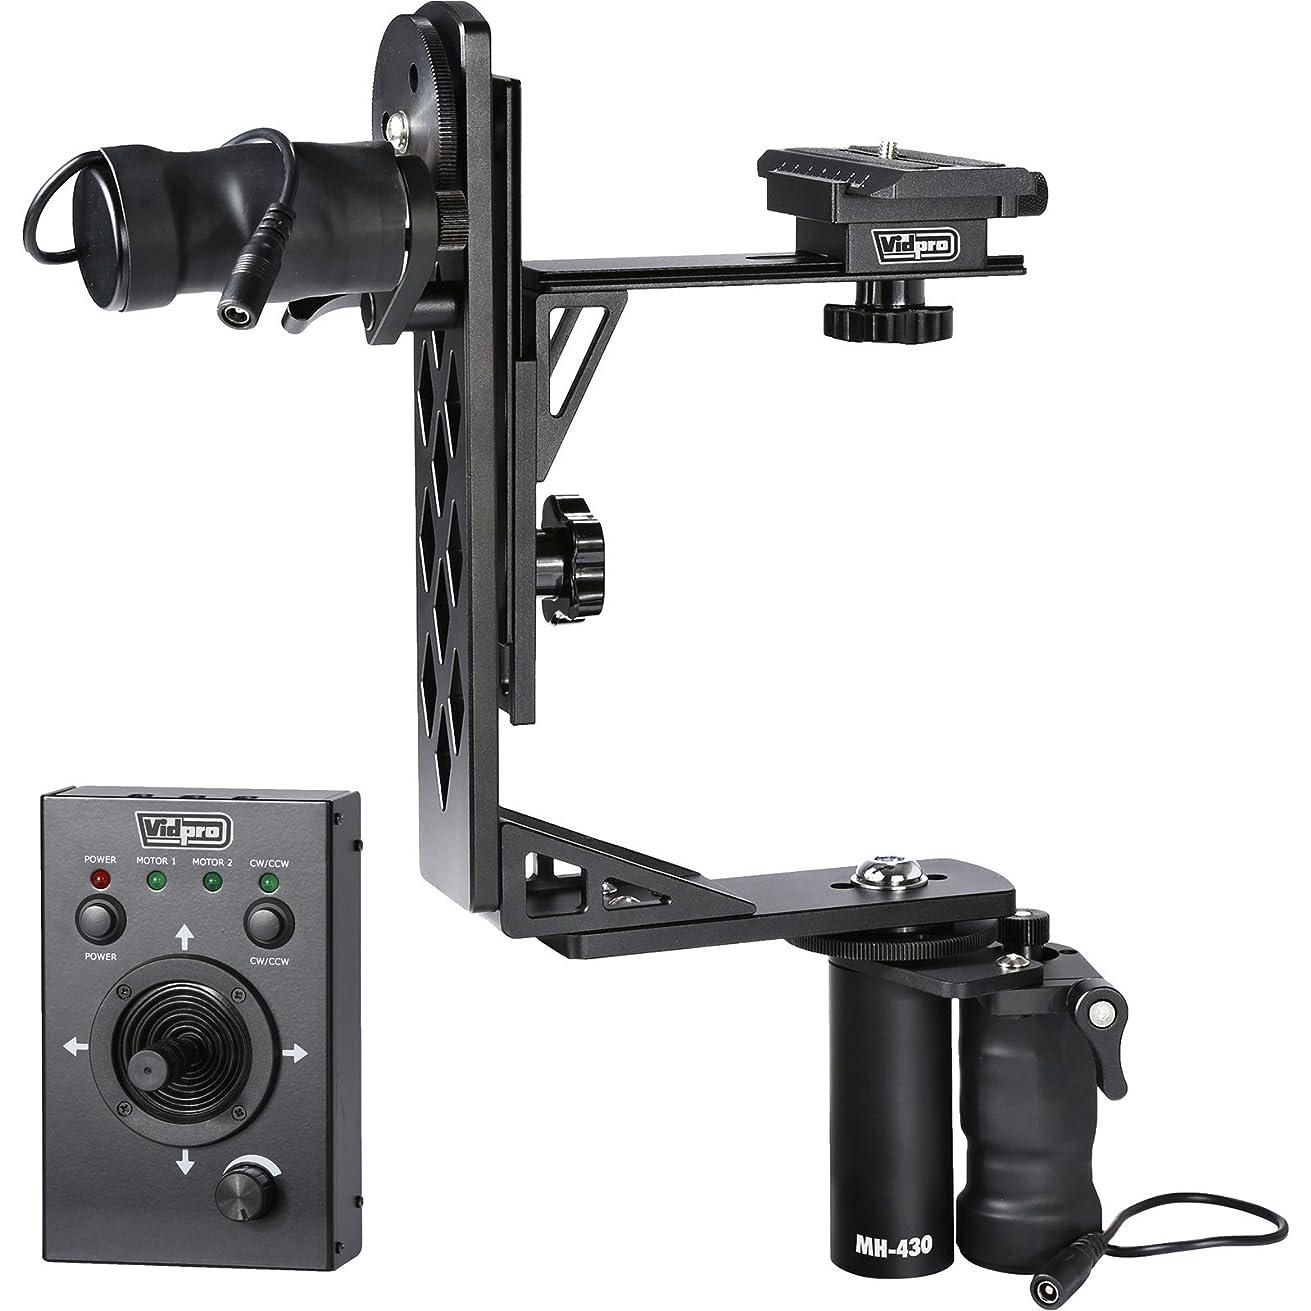 Vidpro MH-430 Professional Motorized Pan & Tilt Gimbal Head Includes: Heavy-Duty Gimbal Head, 2 Geared Motors, Joystick Control, Cables & Case